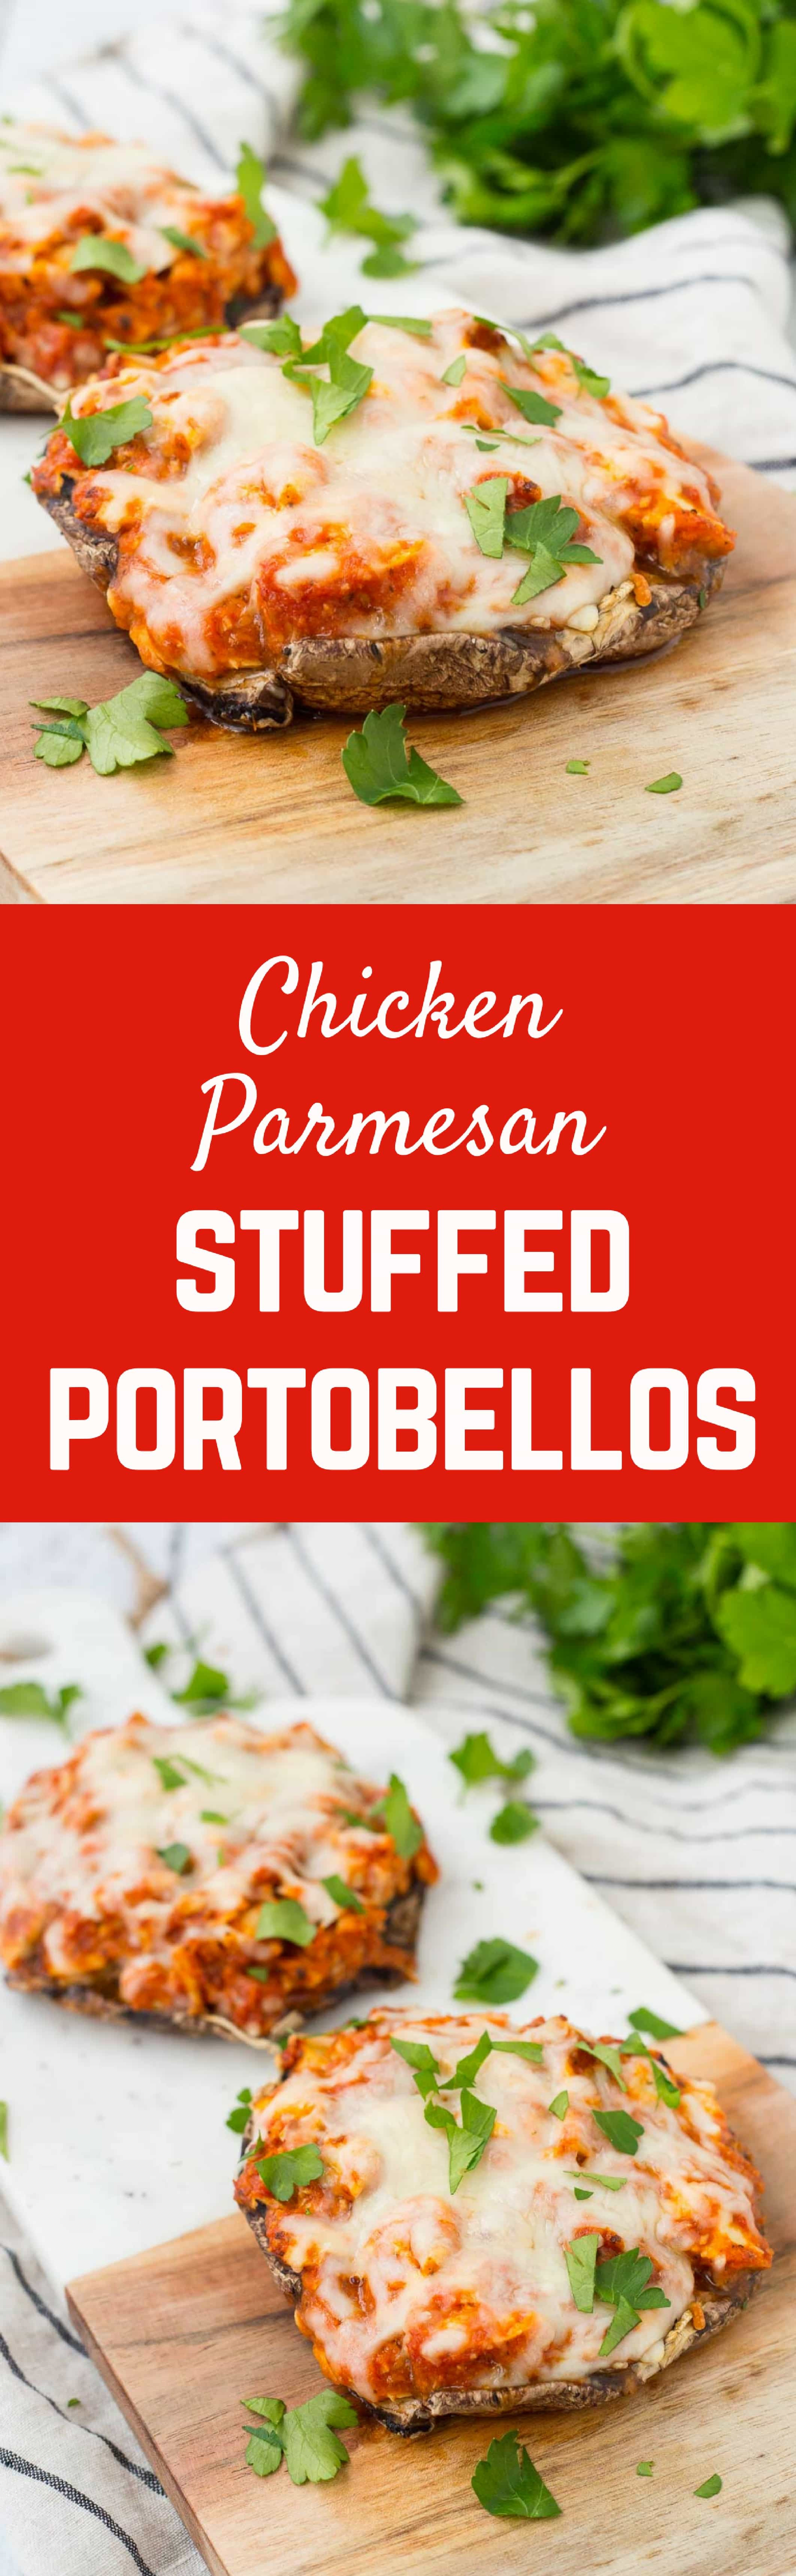 Healthy Crab Stuffed Portobello Mushroom Recipes  healthy stuffed portobello mushroom recipes